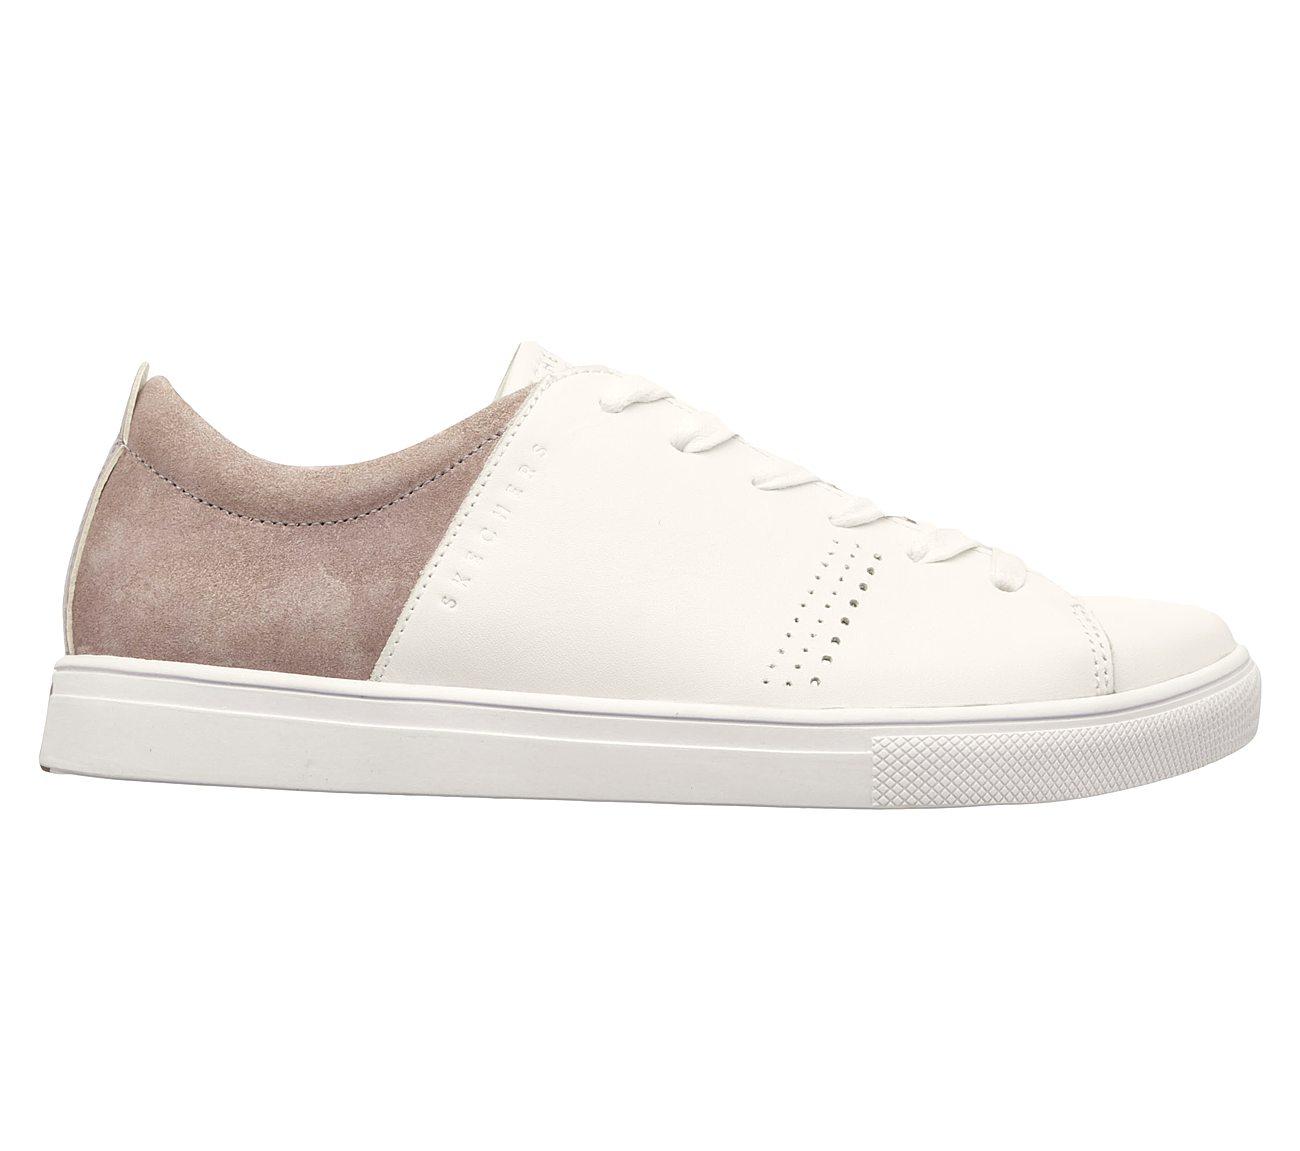 Buy SKECHERS Moda SKECHER Street Shoes